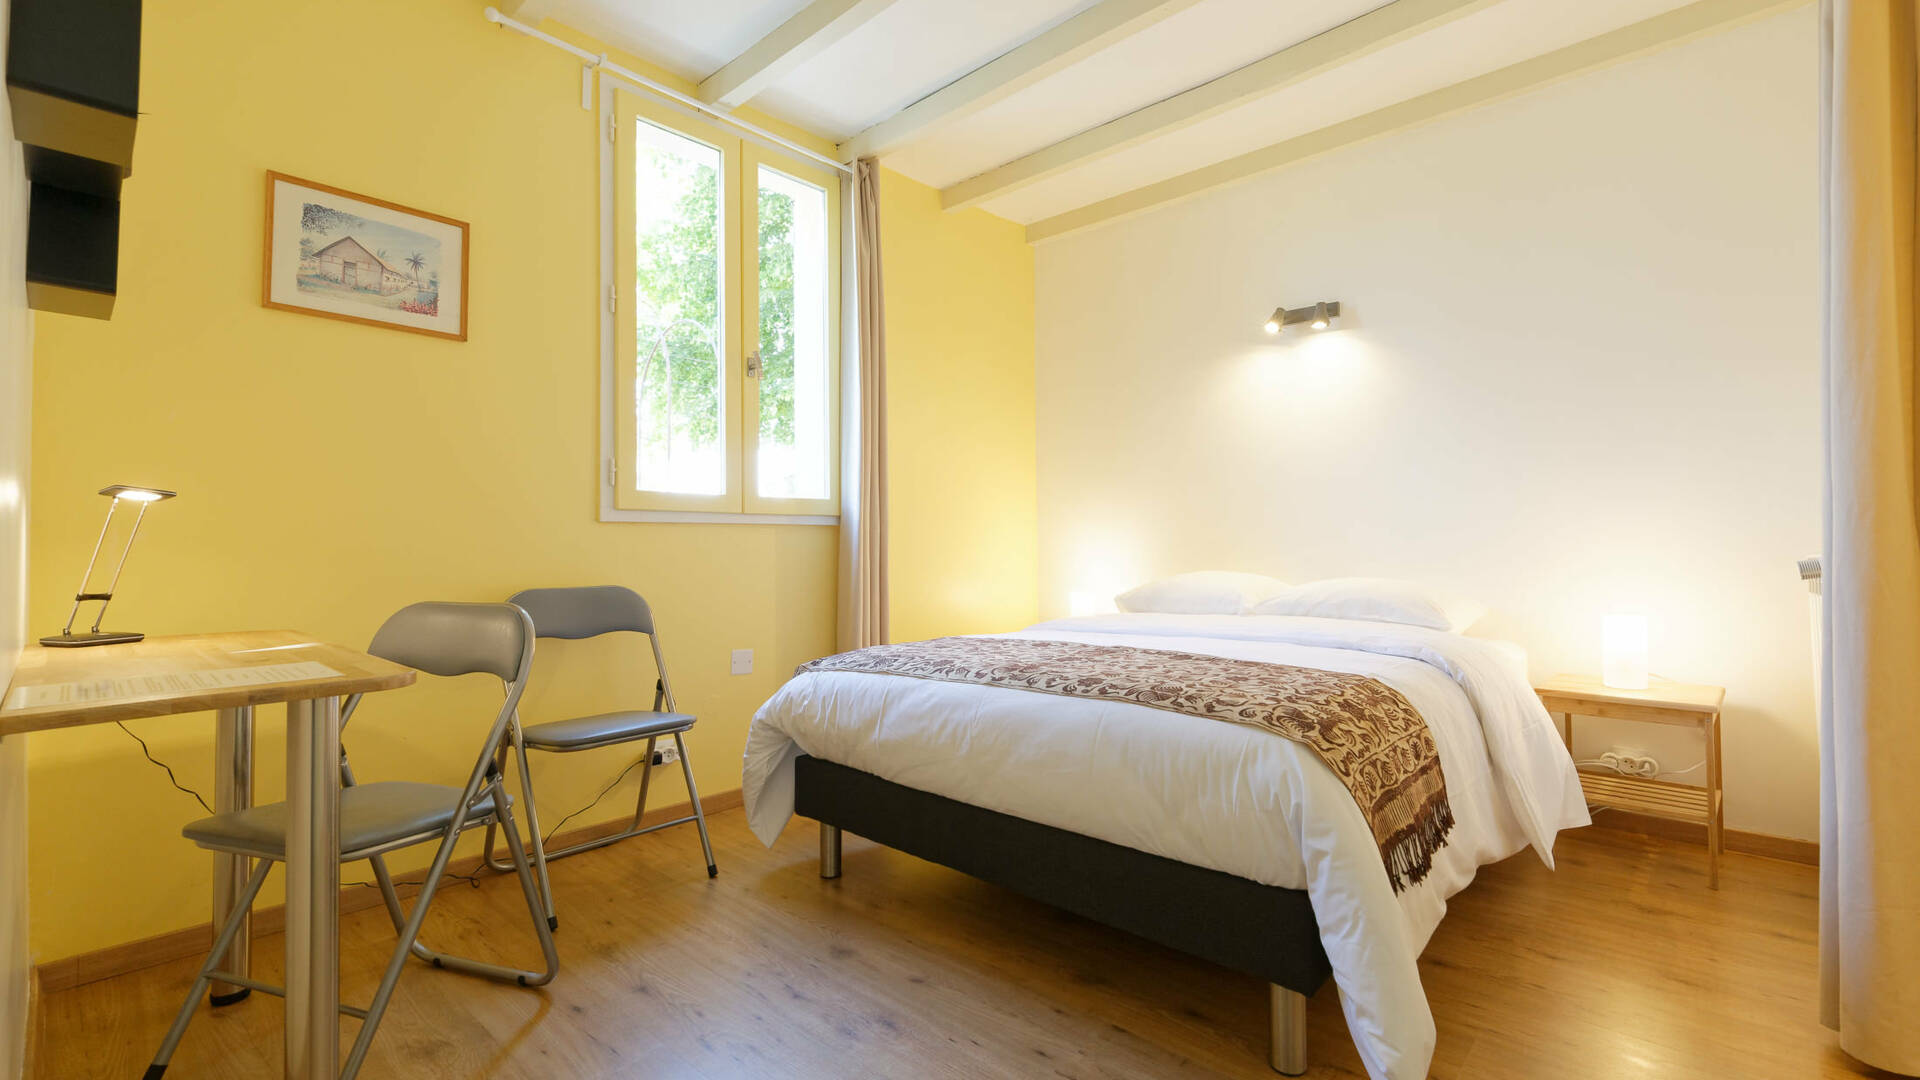 "Bedroom ""Rouletabille"", Gite La Maison Bleue, Savignac-Mona, Lombez, Samatan, Savès, Gascogne, Gers, France"